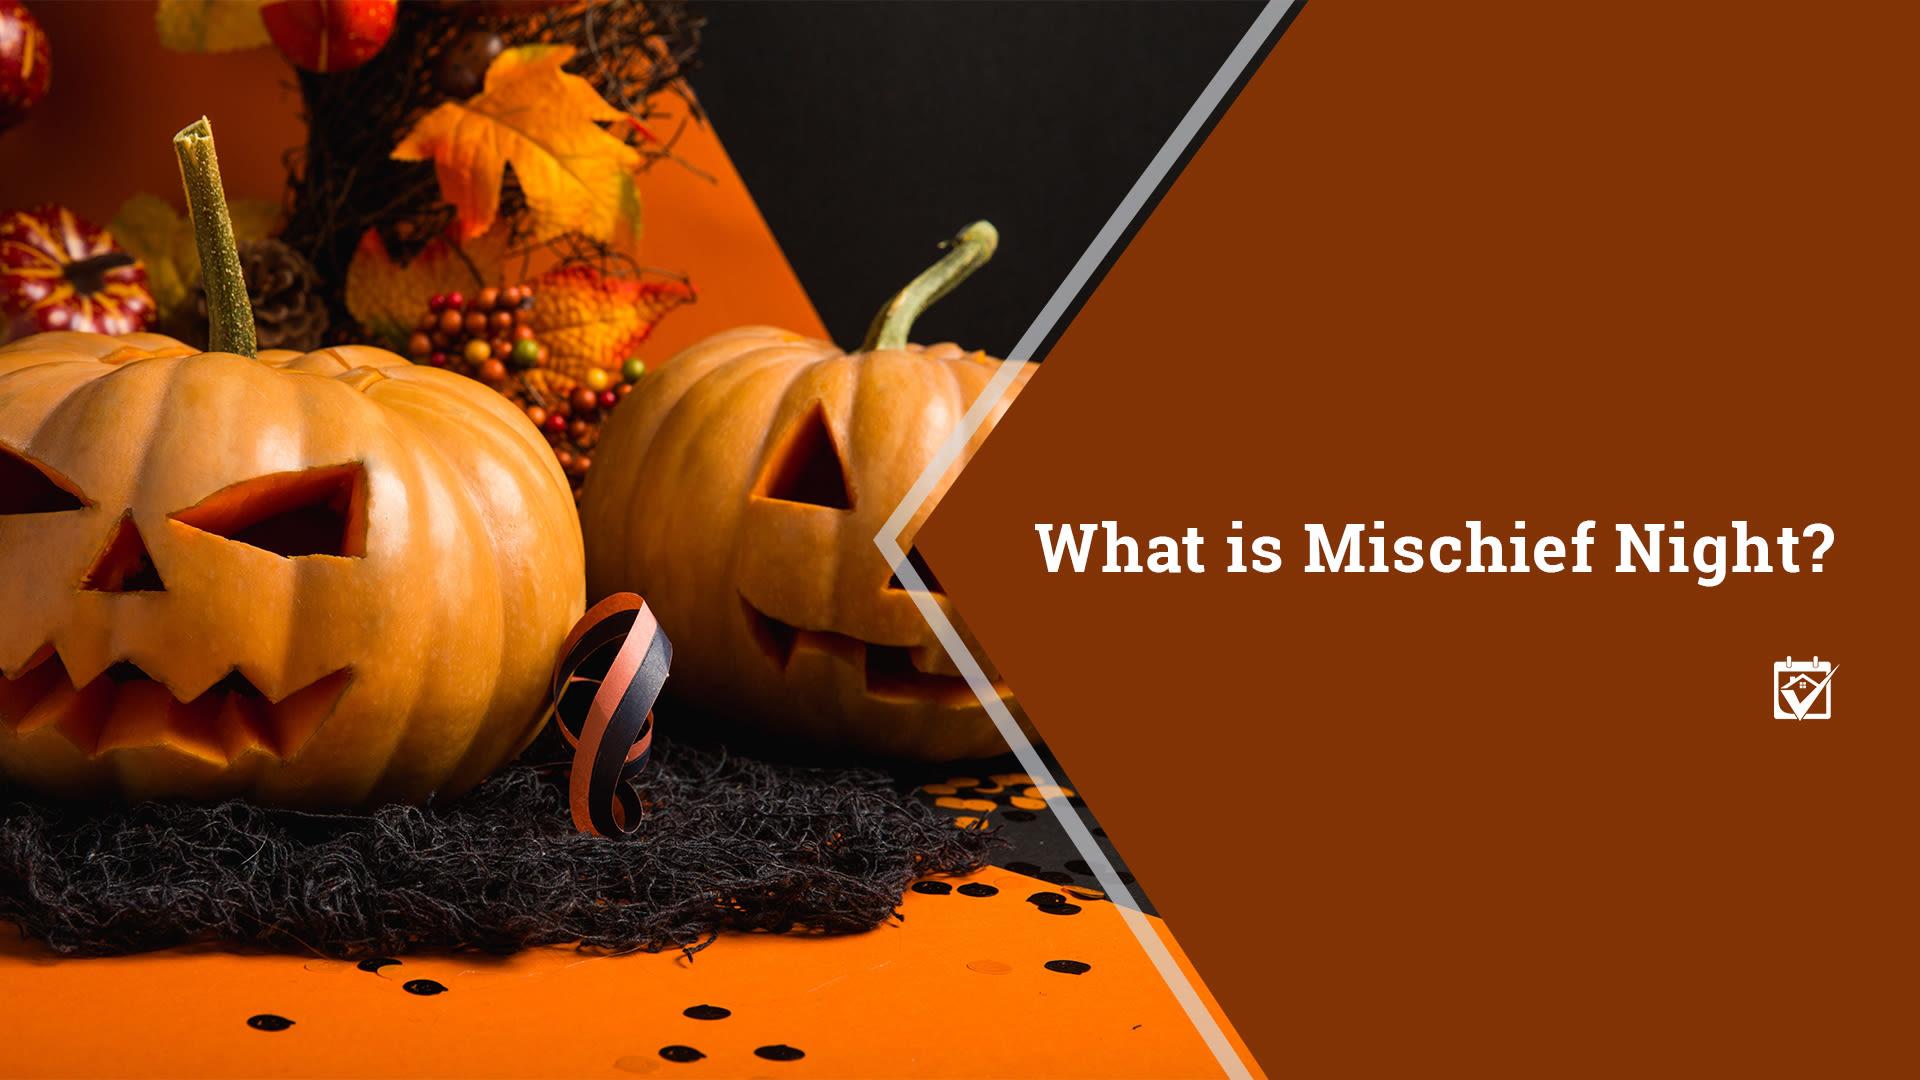 What is Mischief Night?